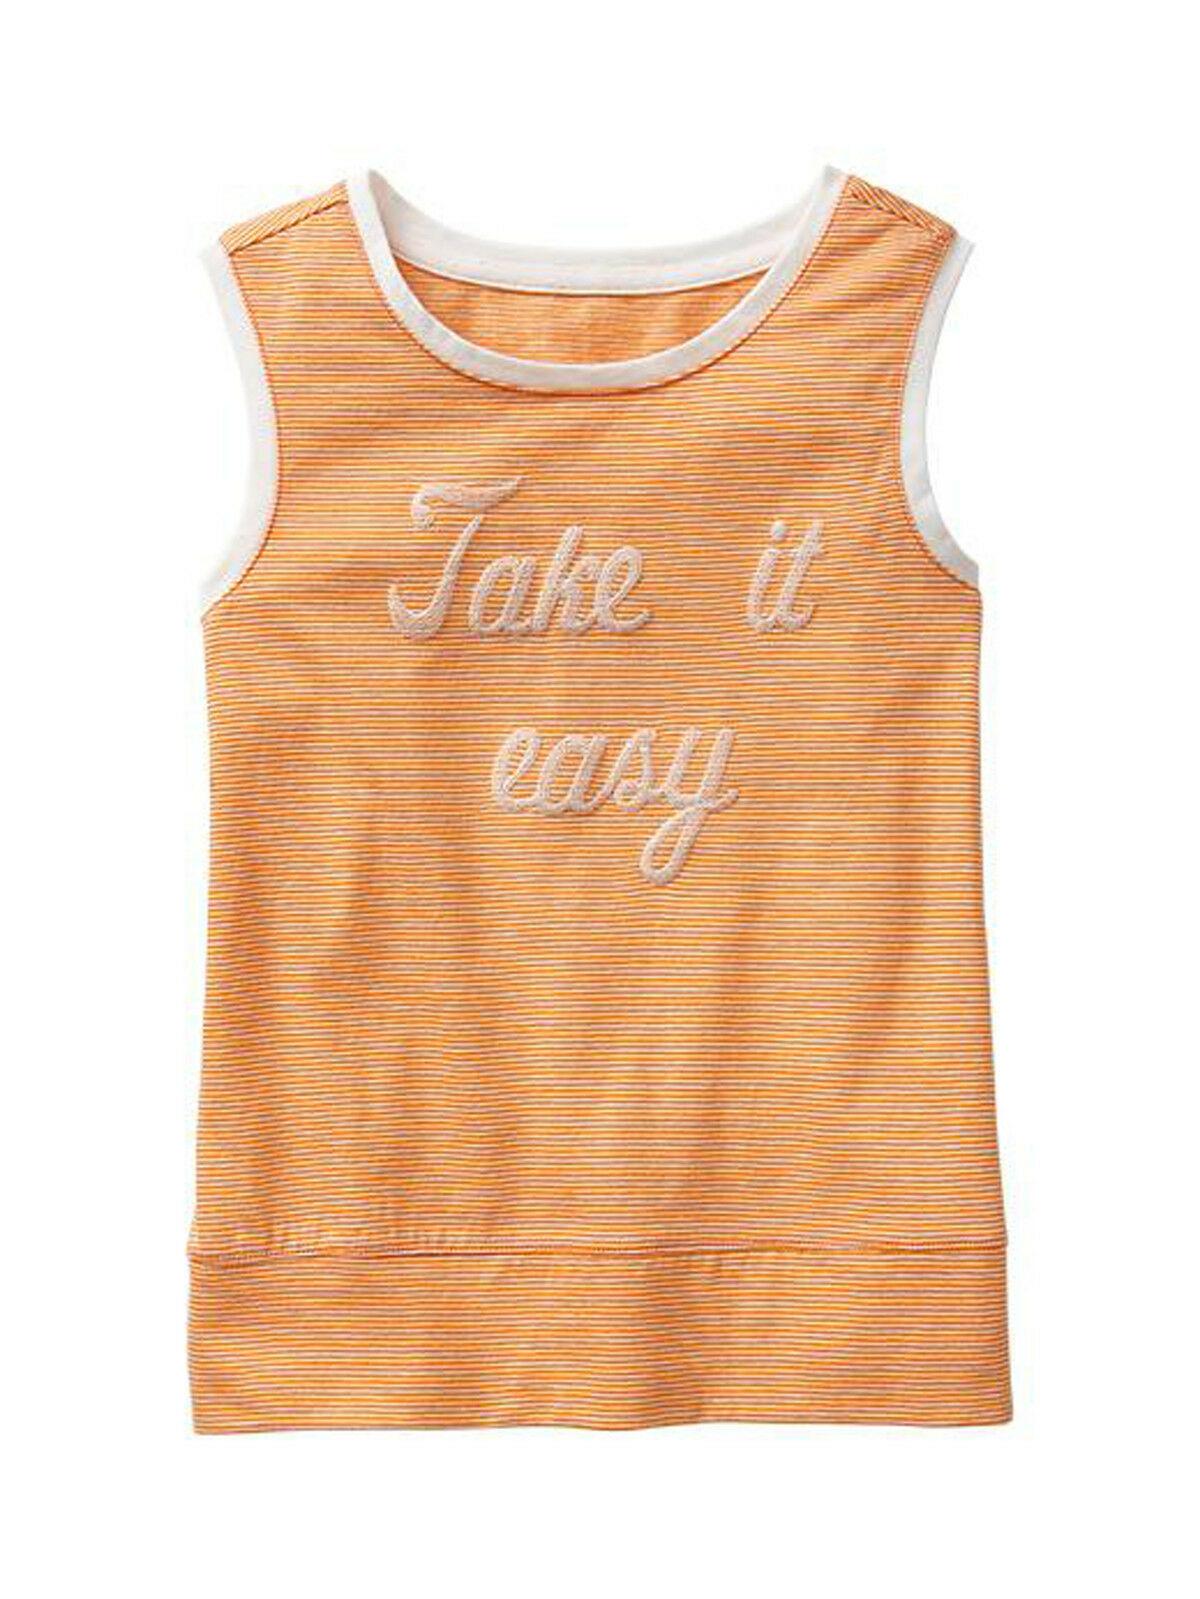 GAP Kids Girls Tank Top Sz  XL 12 Graphic Orange Thin Stripe Sleeveless Trim New